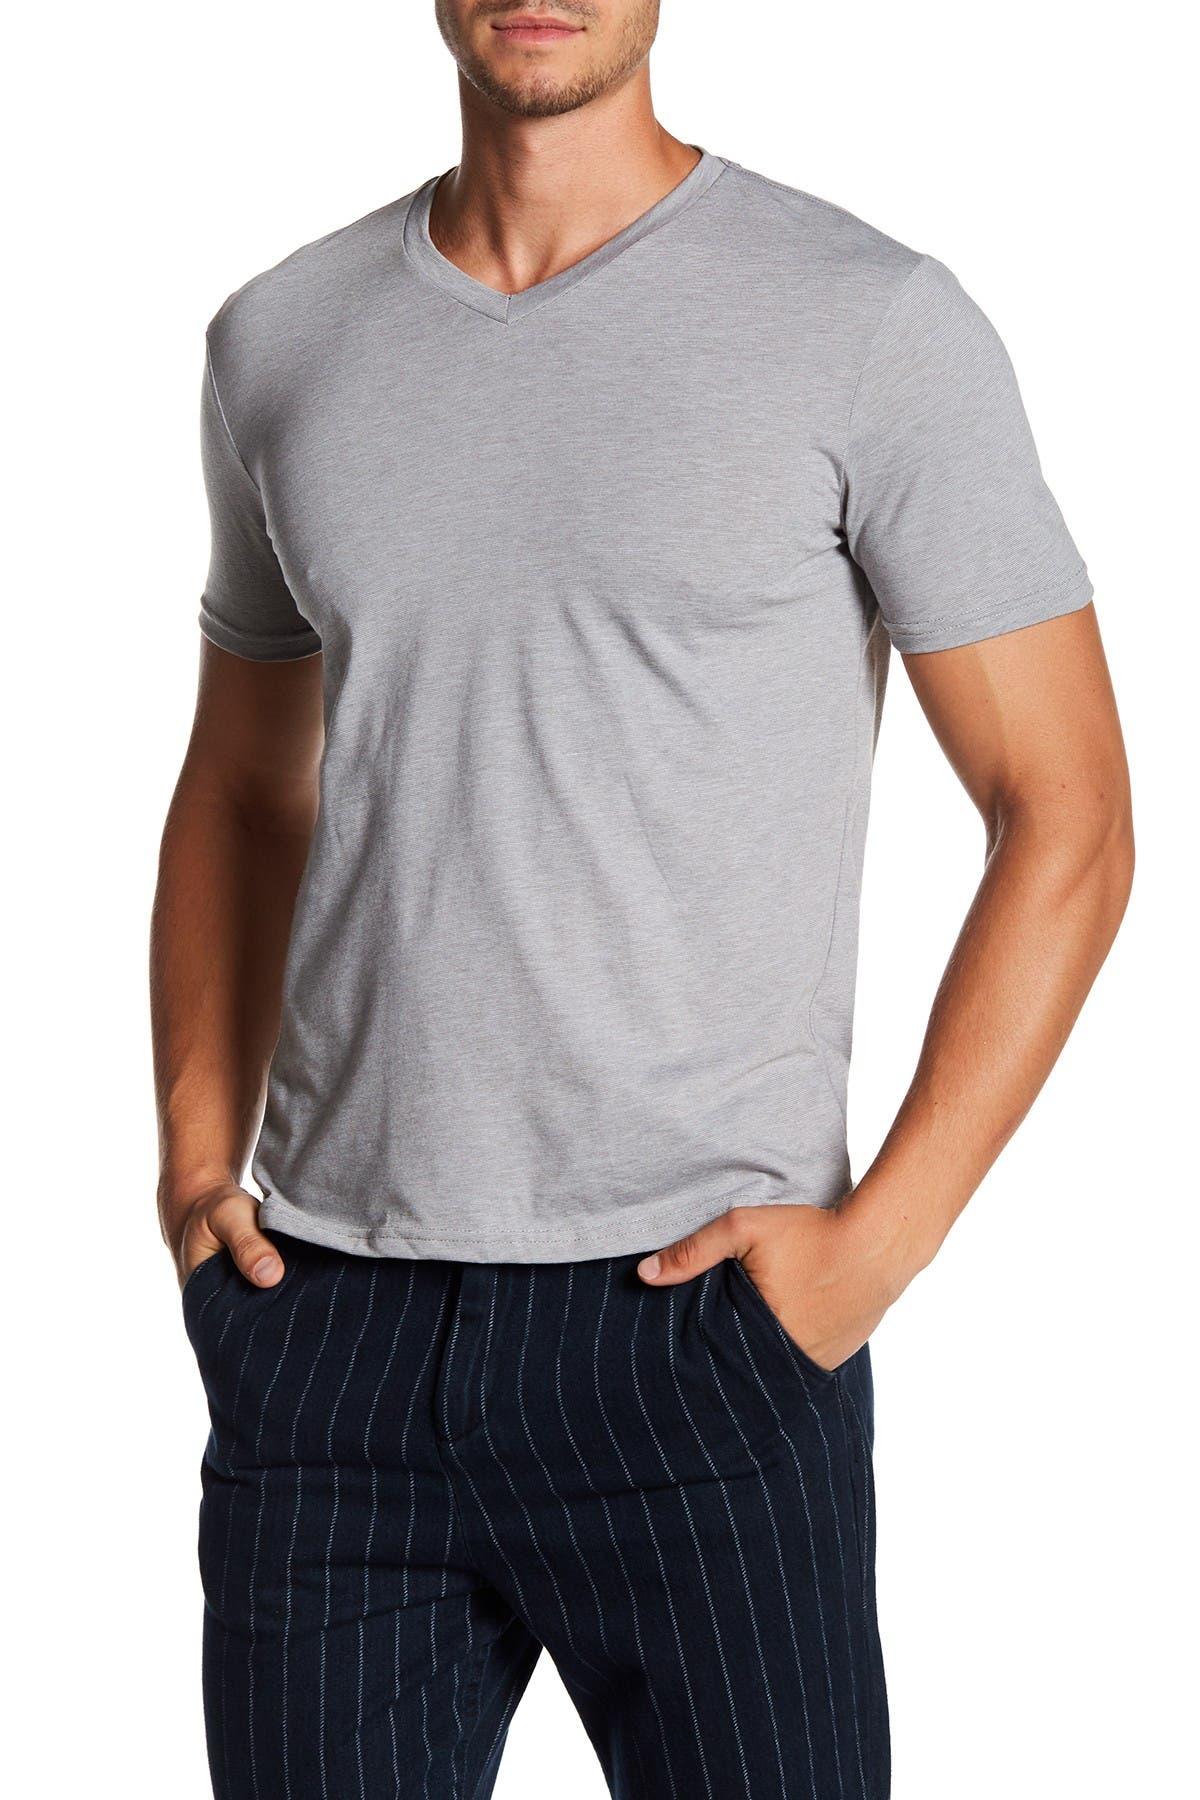 Image of Public Opinion Fineline V-Neck T-Shirt